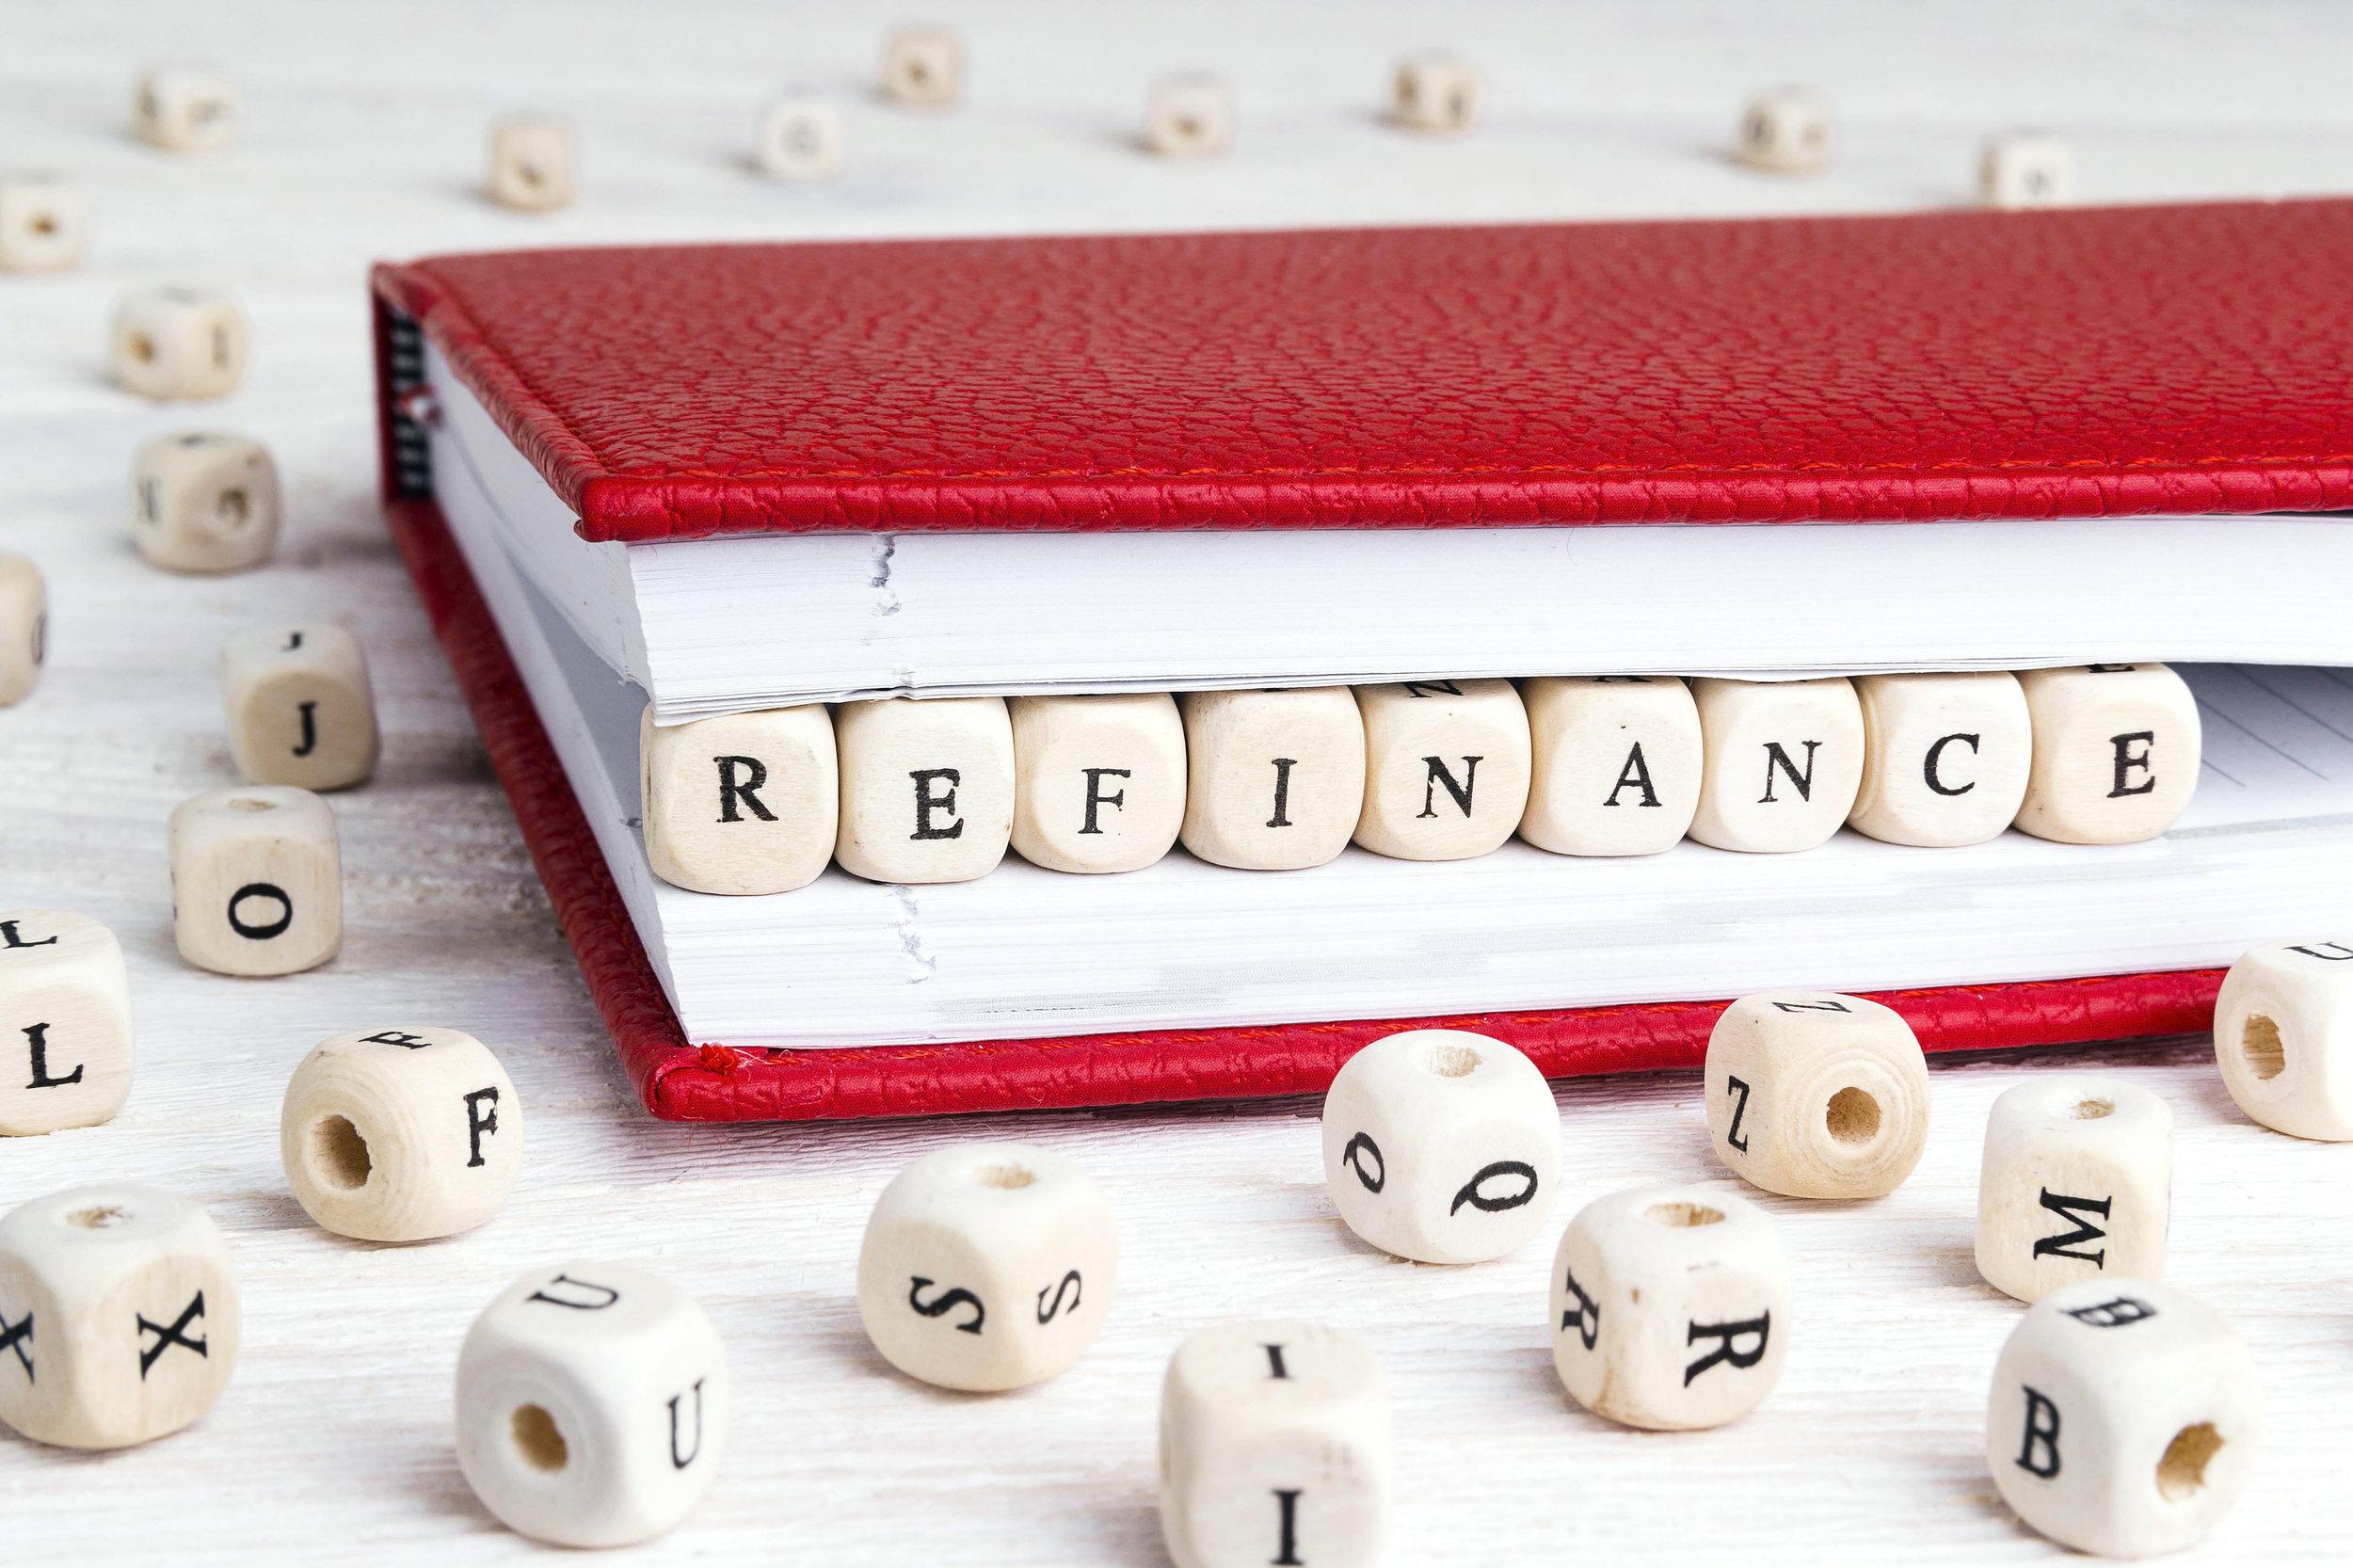 refinance-book-letters.jpg